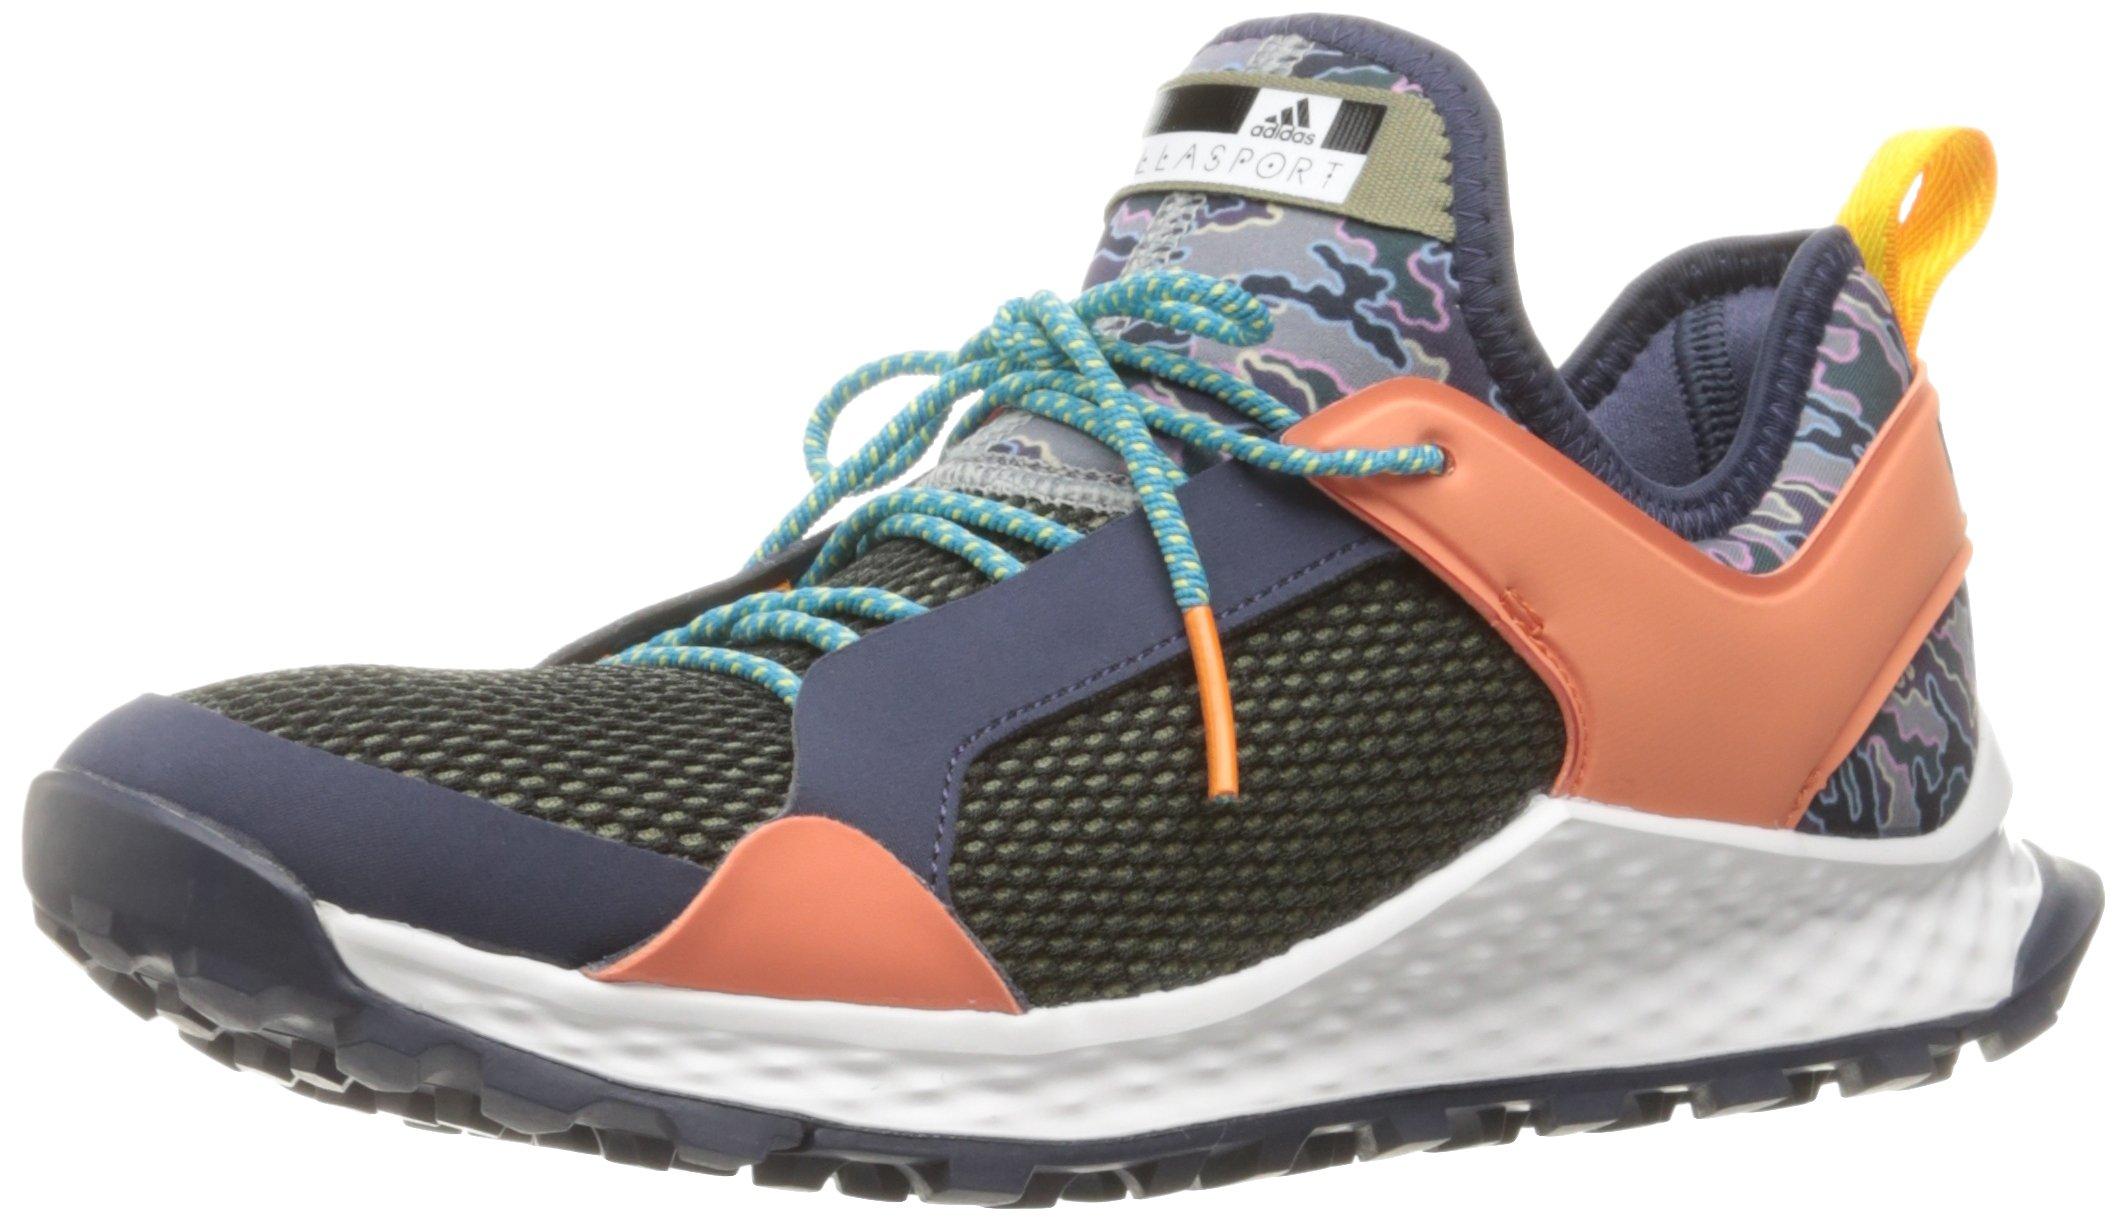 adidas Performance Women's Shoes   Aleki X Cross-Trainer, Black/Bliss Coral/Intense Blue, (9 M US)